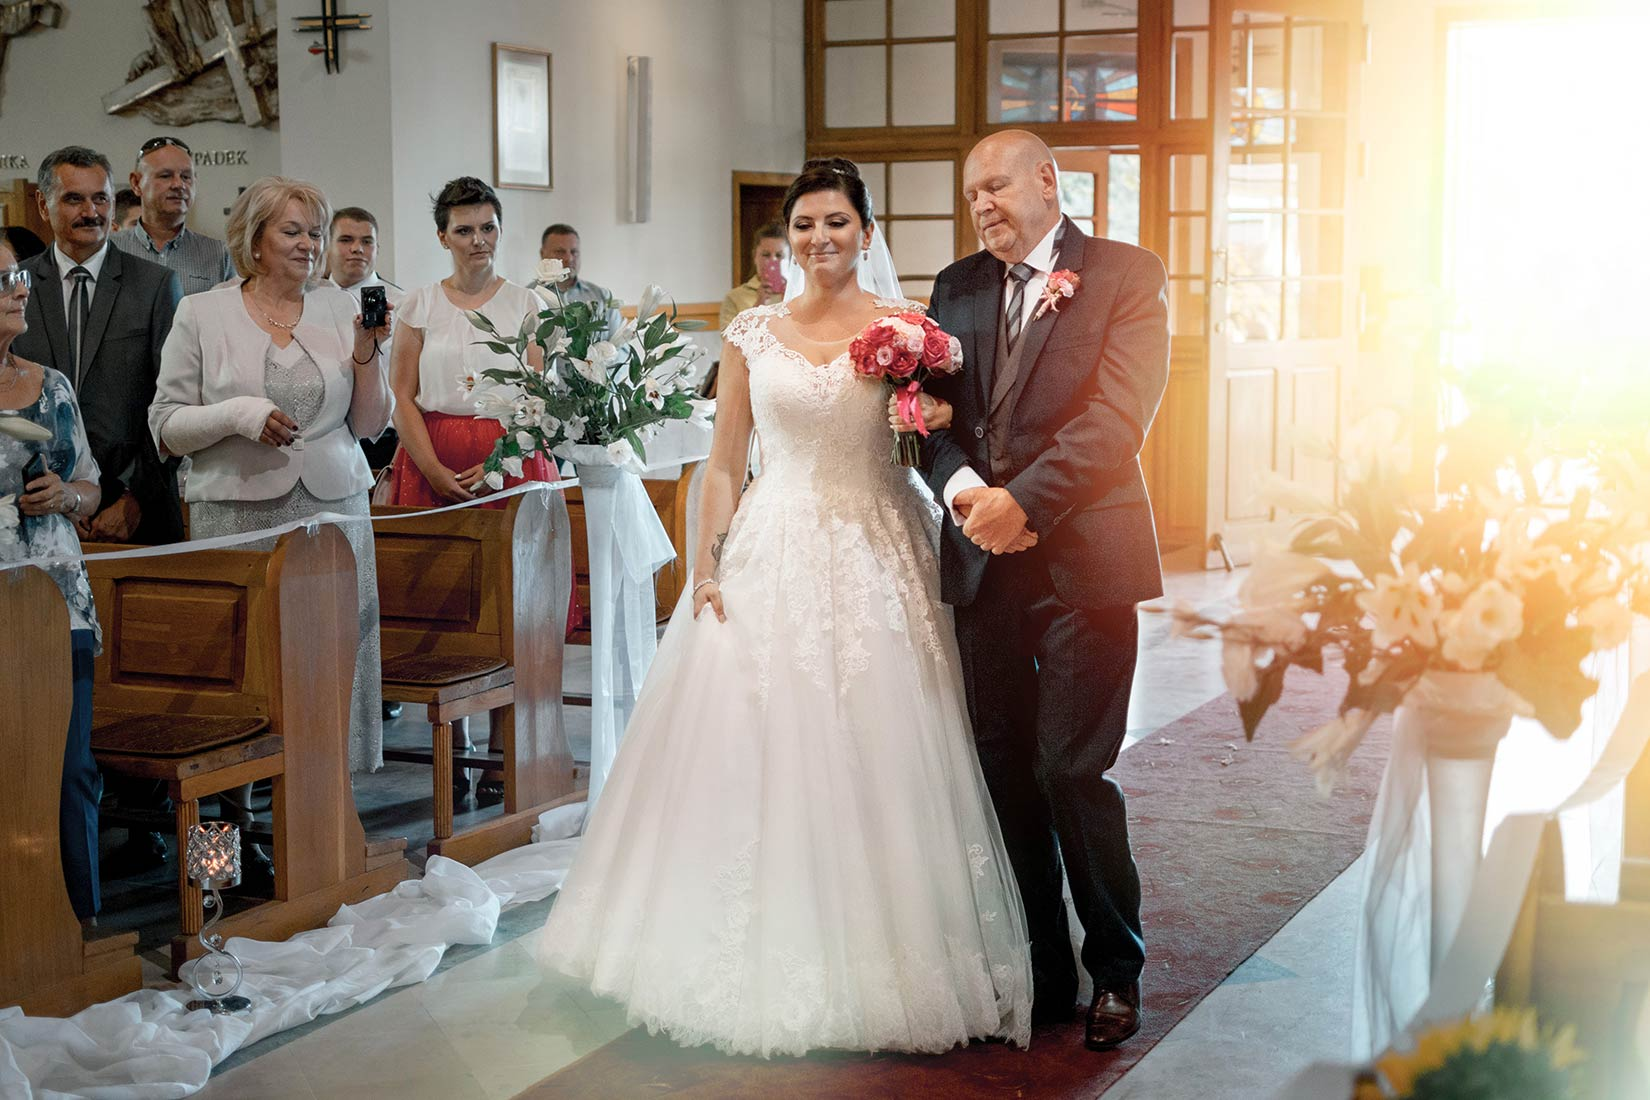 fotograf na ślub kościół zdjęcia